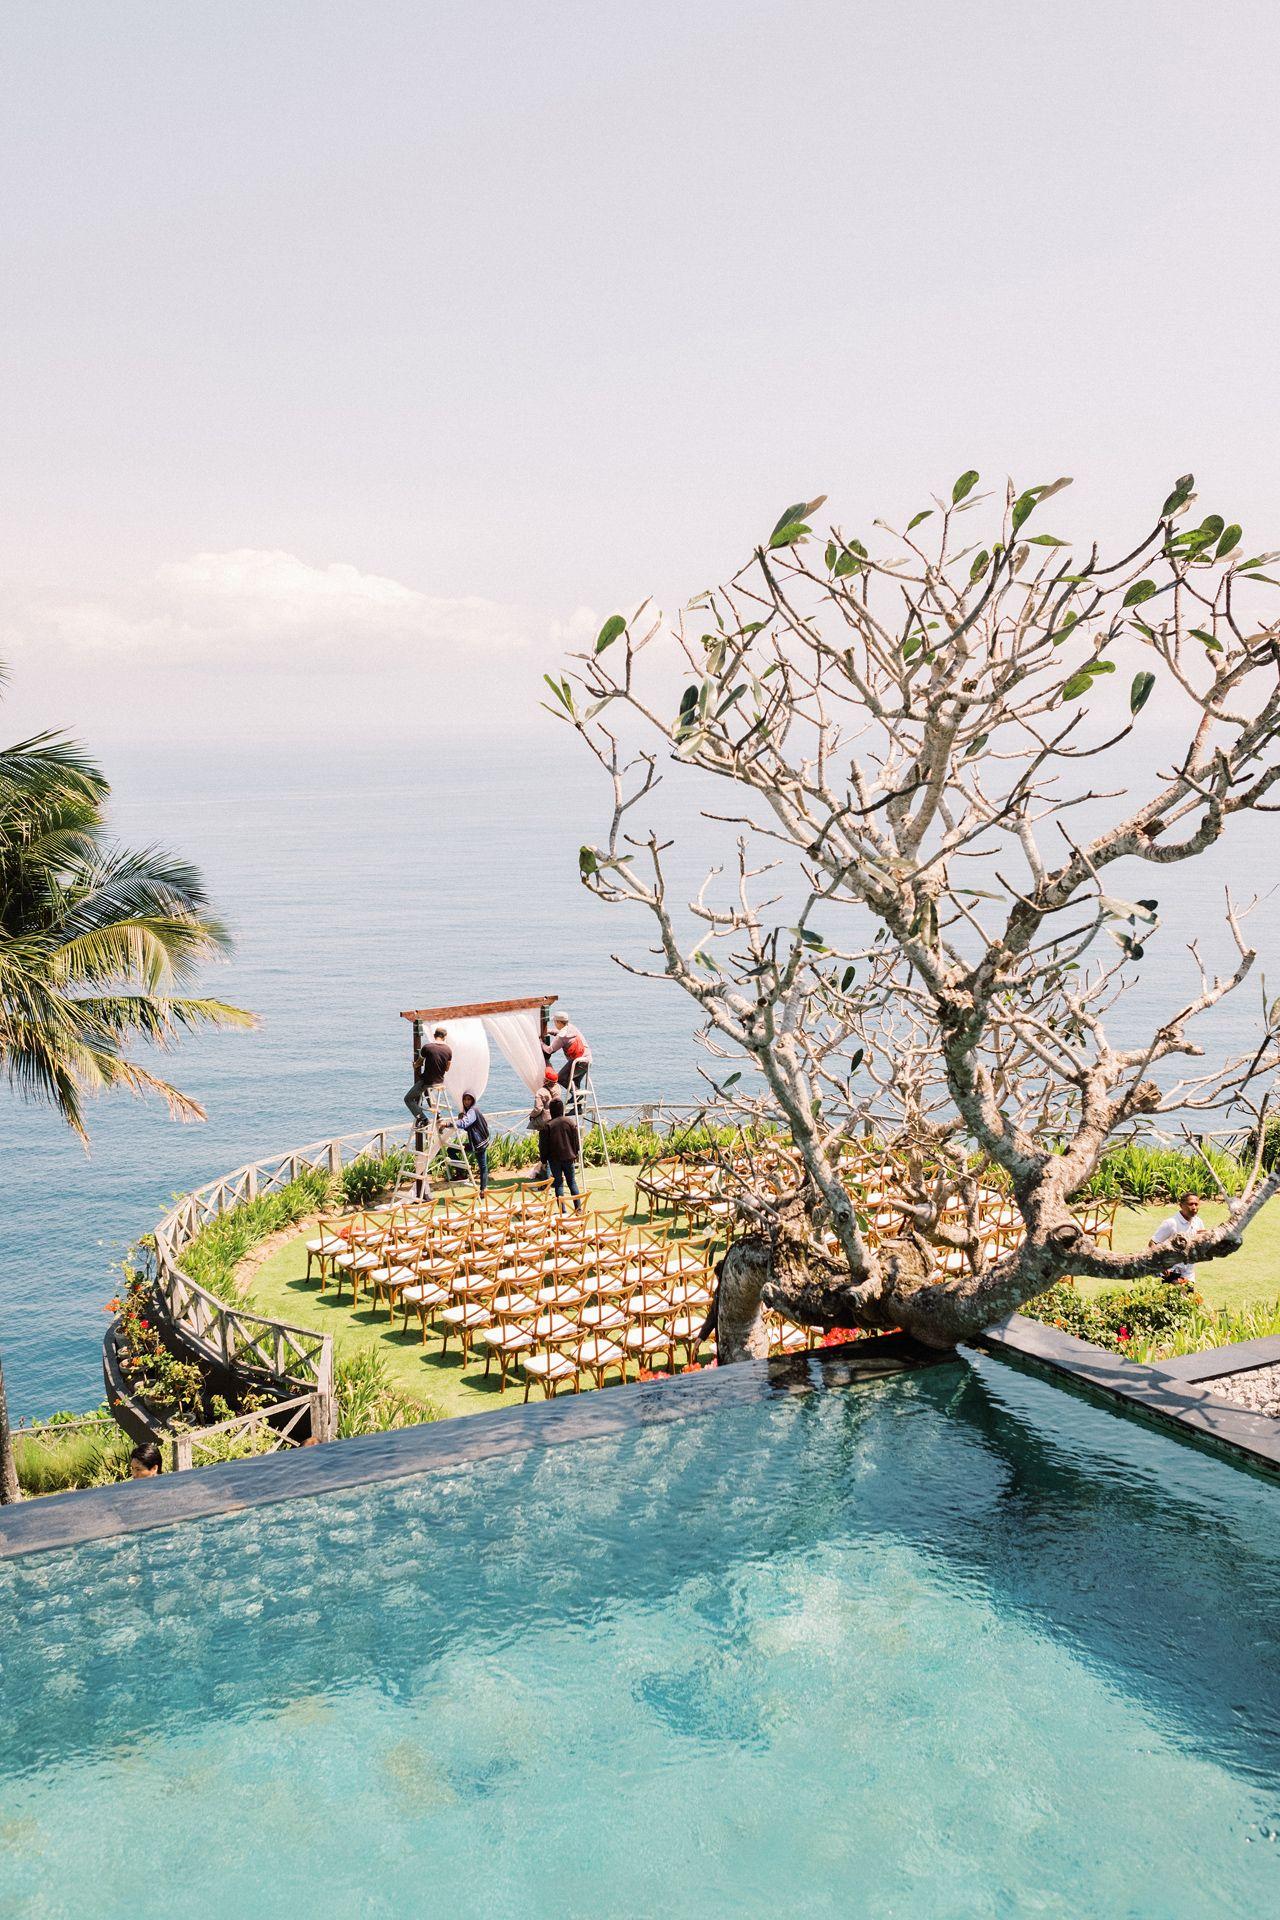 C W Bali Summer Khayangan Estate Wedding 6 In 2020 Bali Wedding Beach Wedding Aisles Estate Wedding